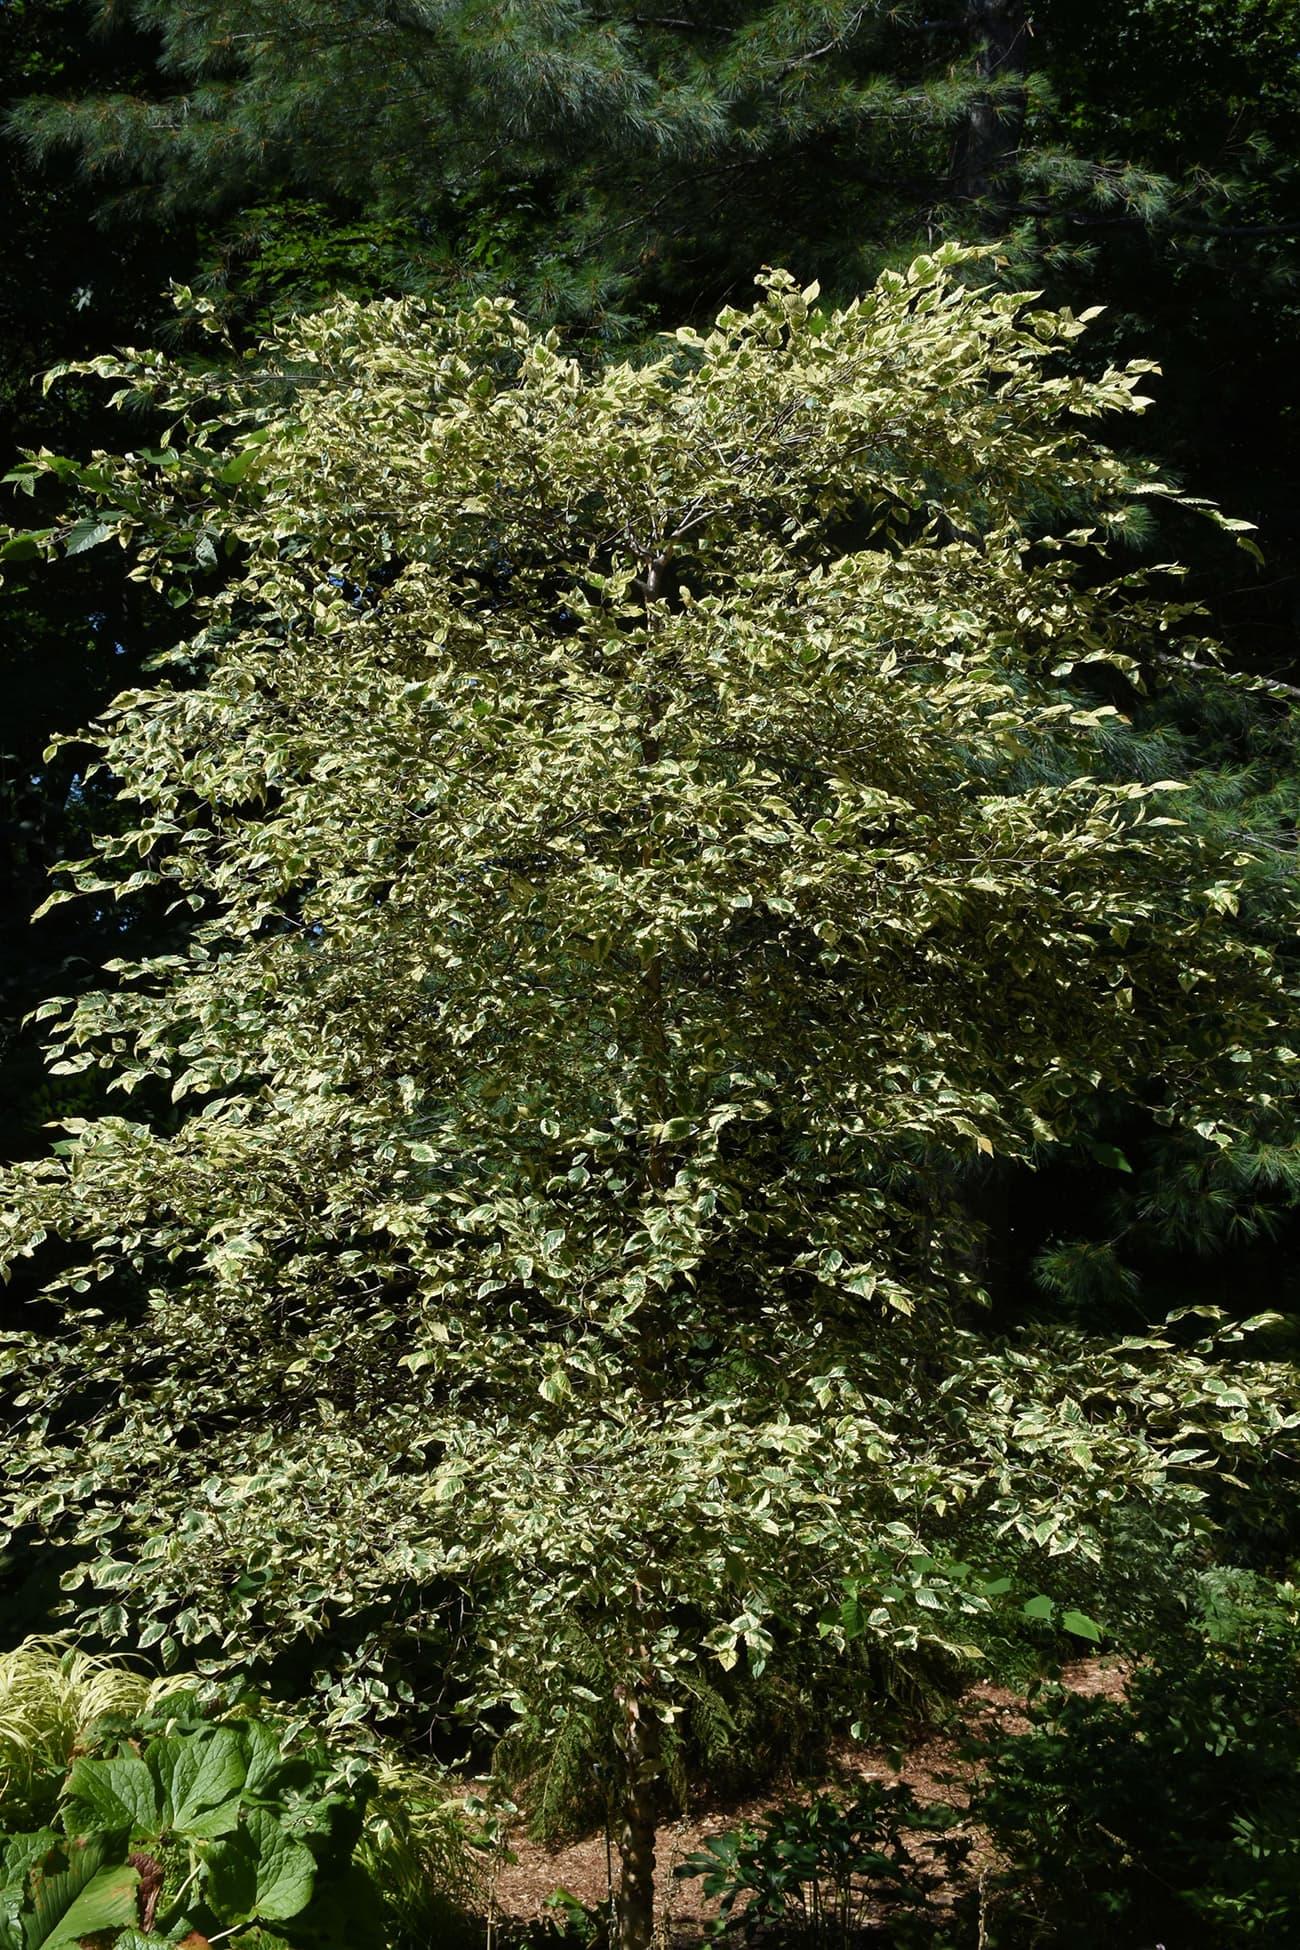 Shiloh Splash River Birch : shiloh, splash, river, birch, LandscapeHub, Plant, Information, Betula, Nigra, 'Shiloh, Splash', (Shiloh, Splash, River, Birch)